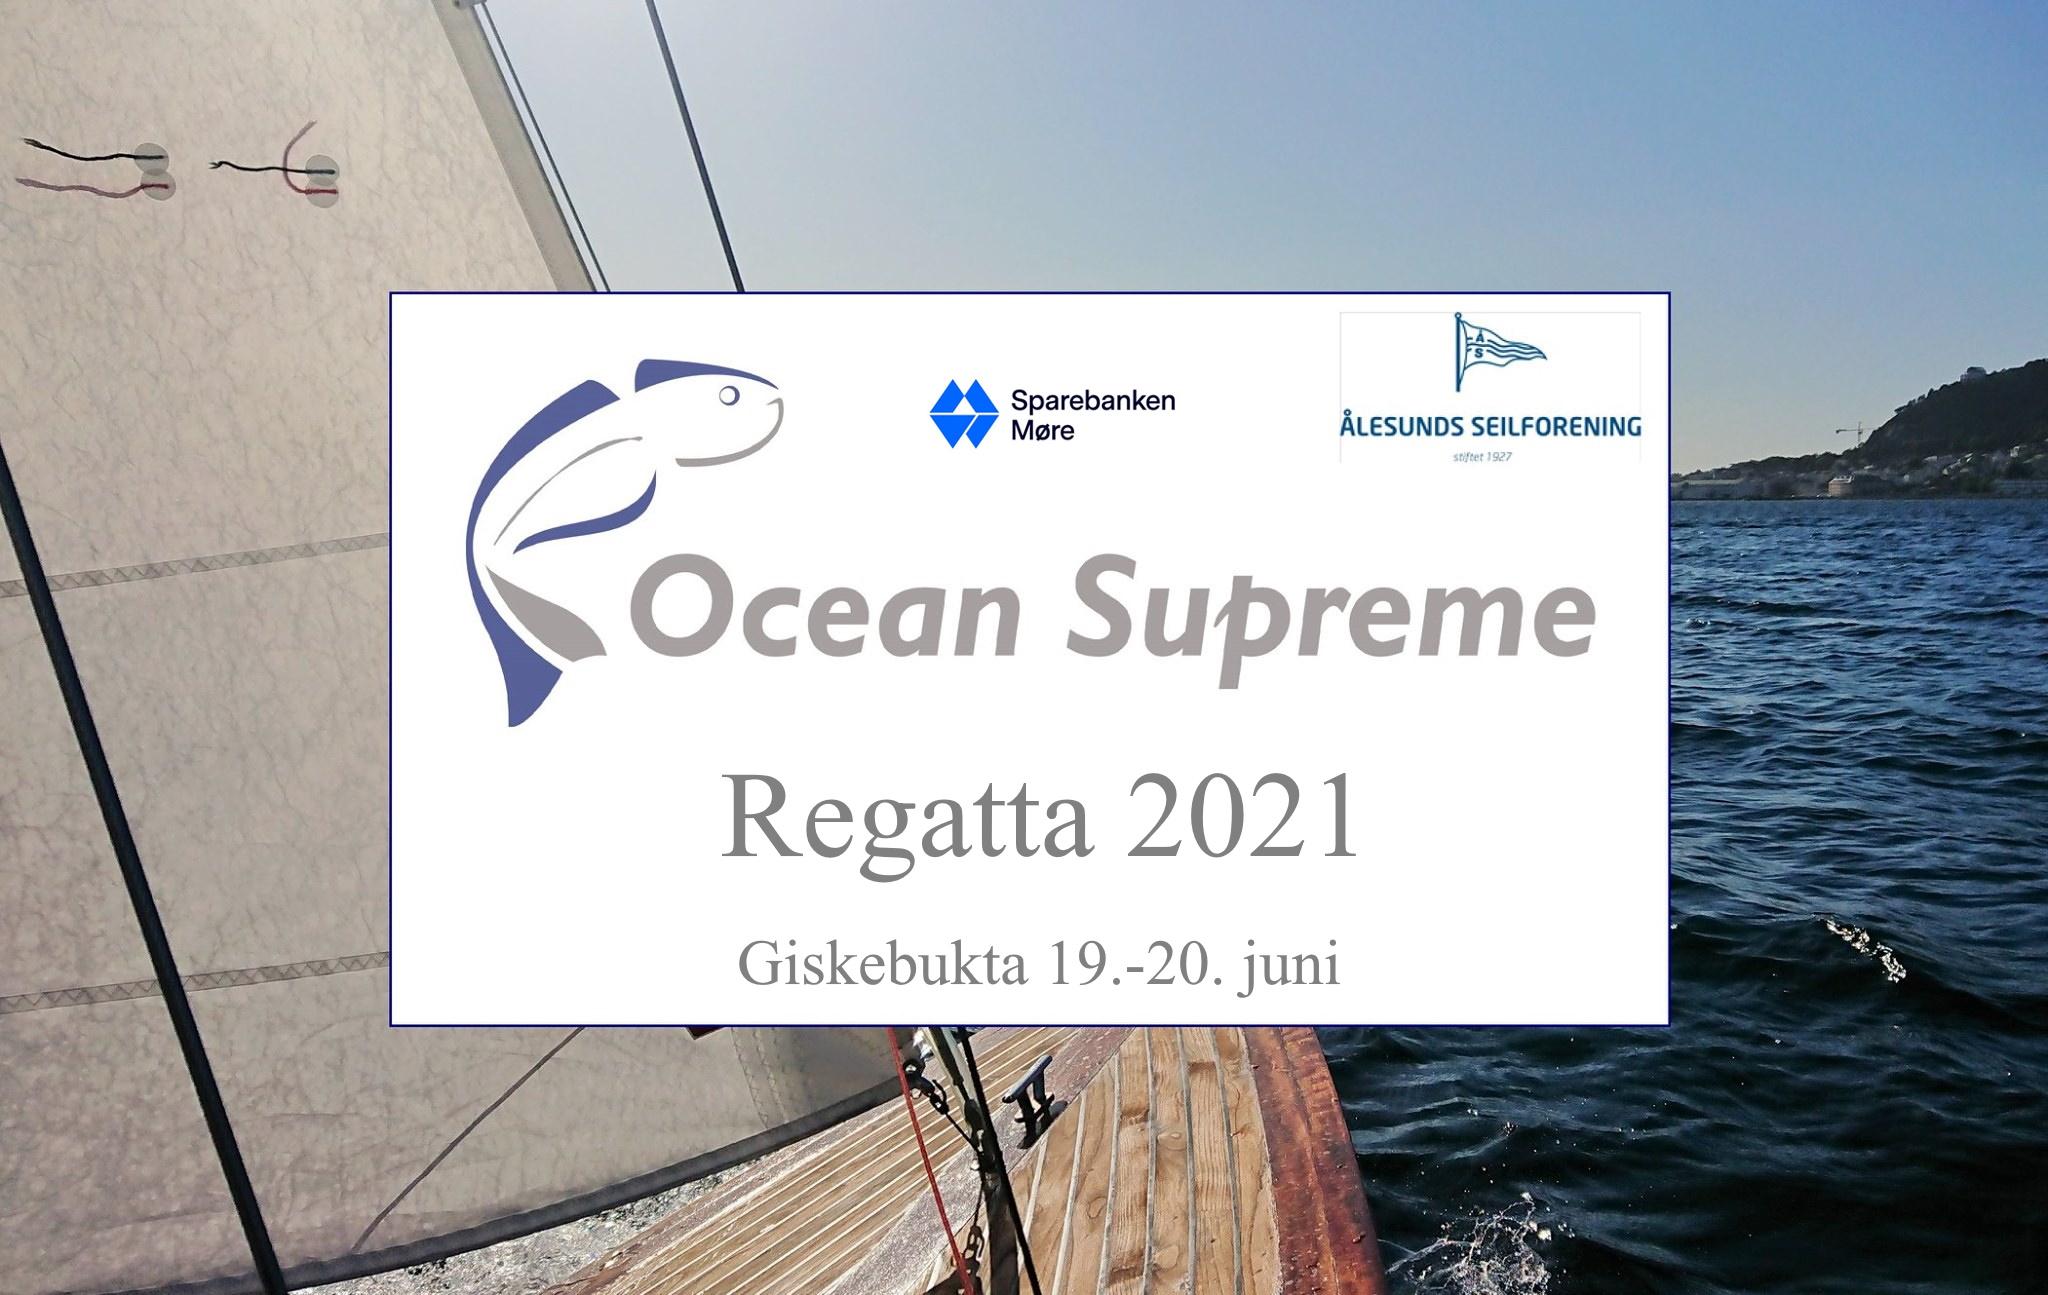 Ocean Supreme Regatta helgen 19.-20. juni